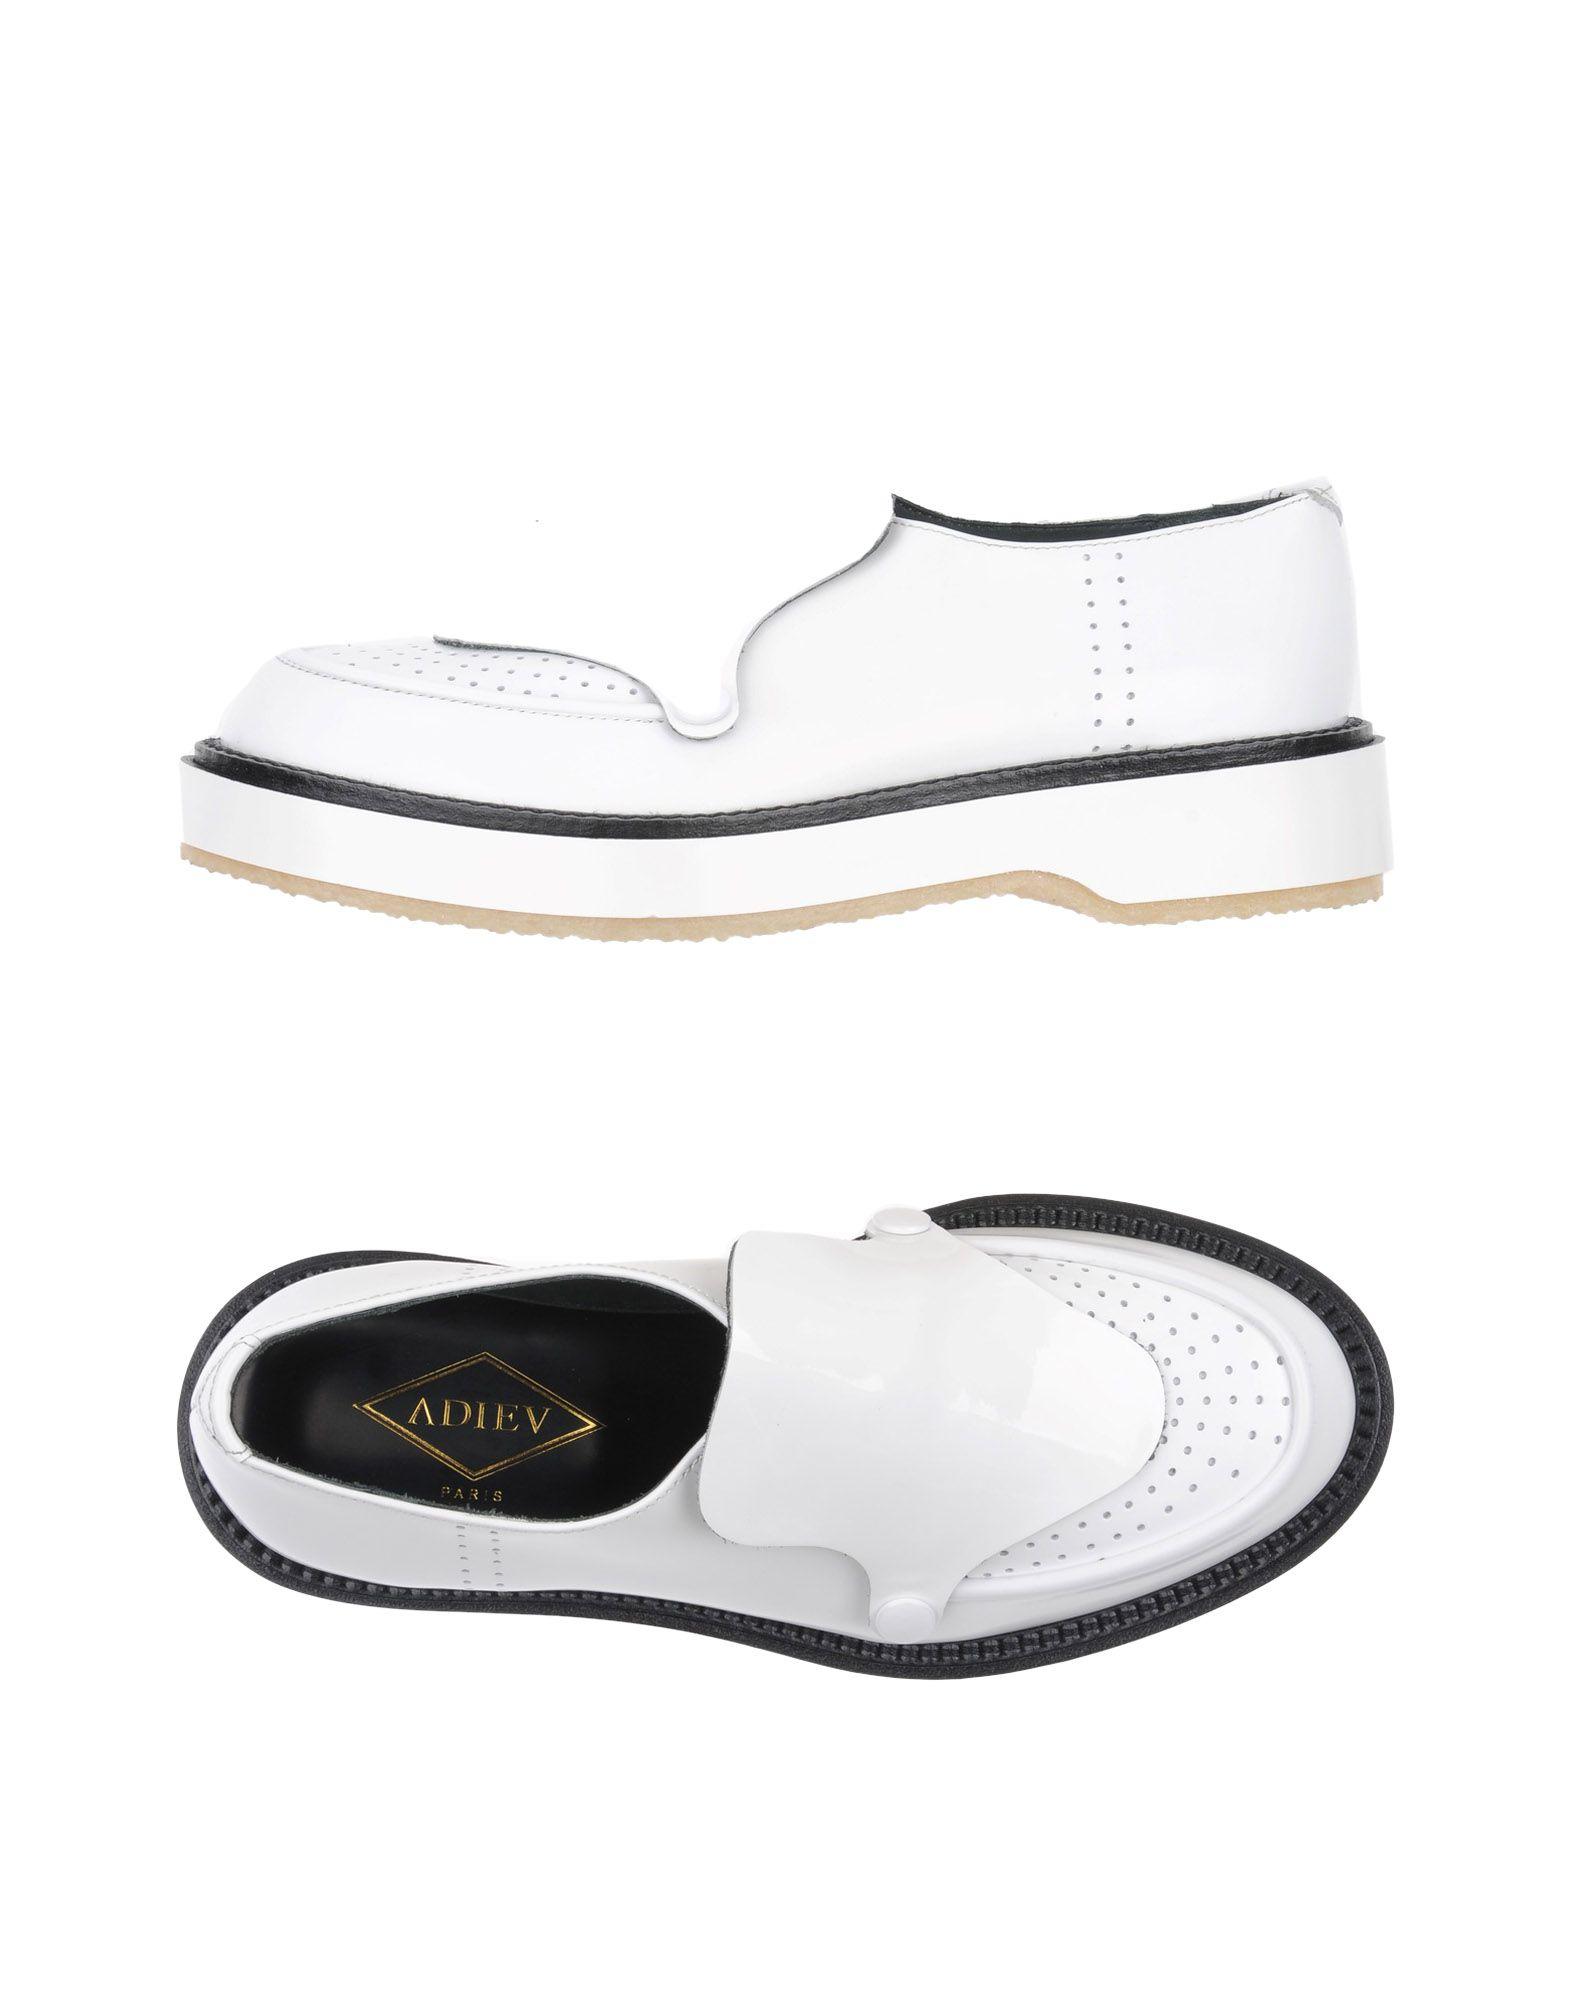 Haltbare Mode billige Schuhe Adieu Mokassins Damen  11289839BE Heiße Schuhe